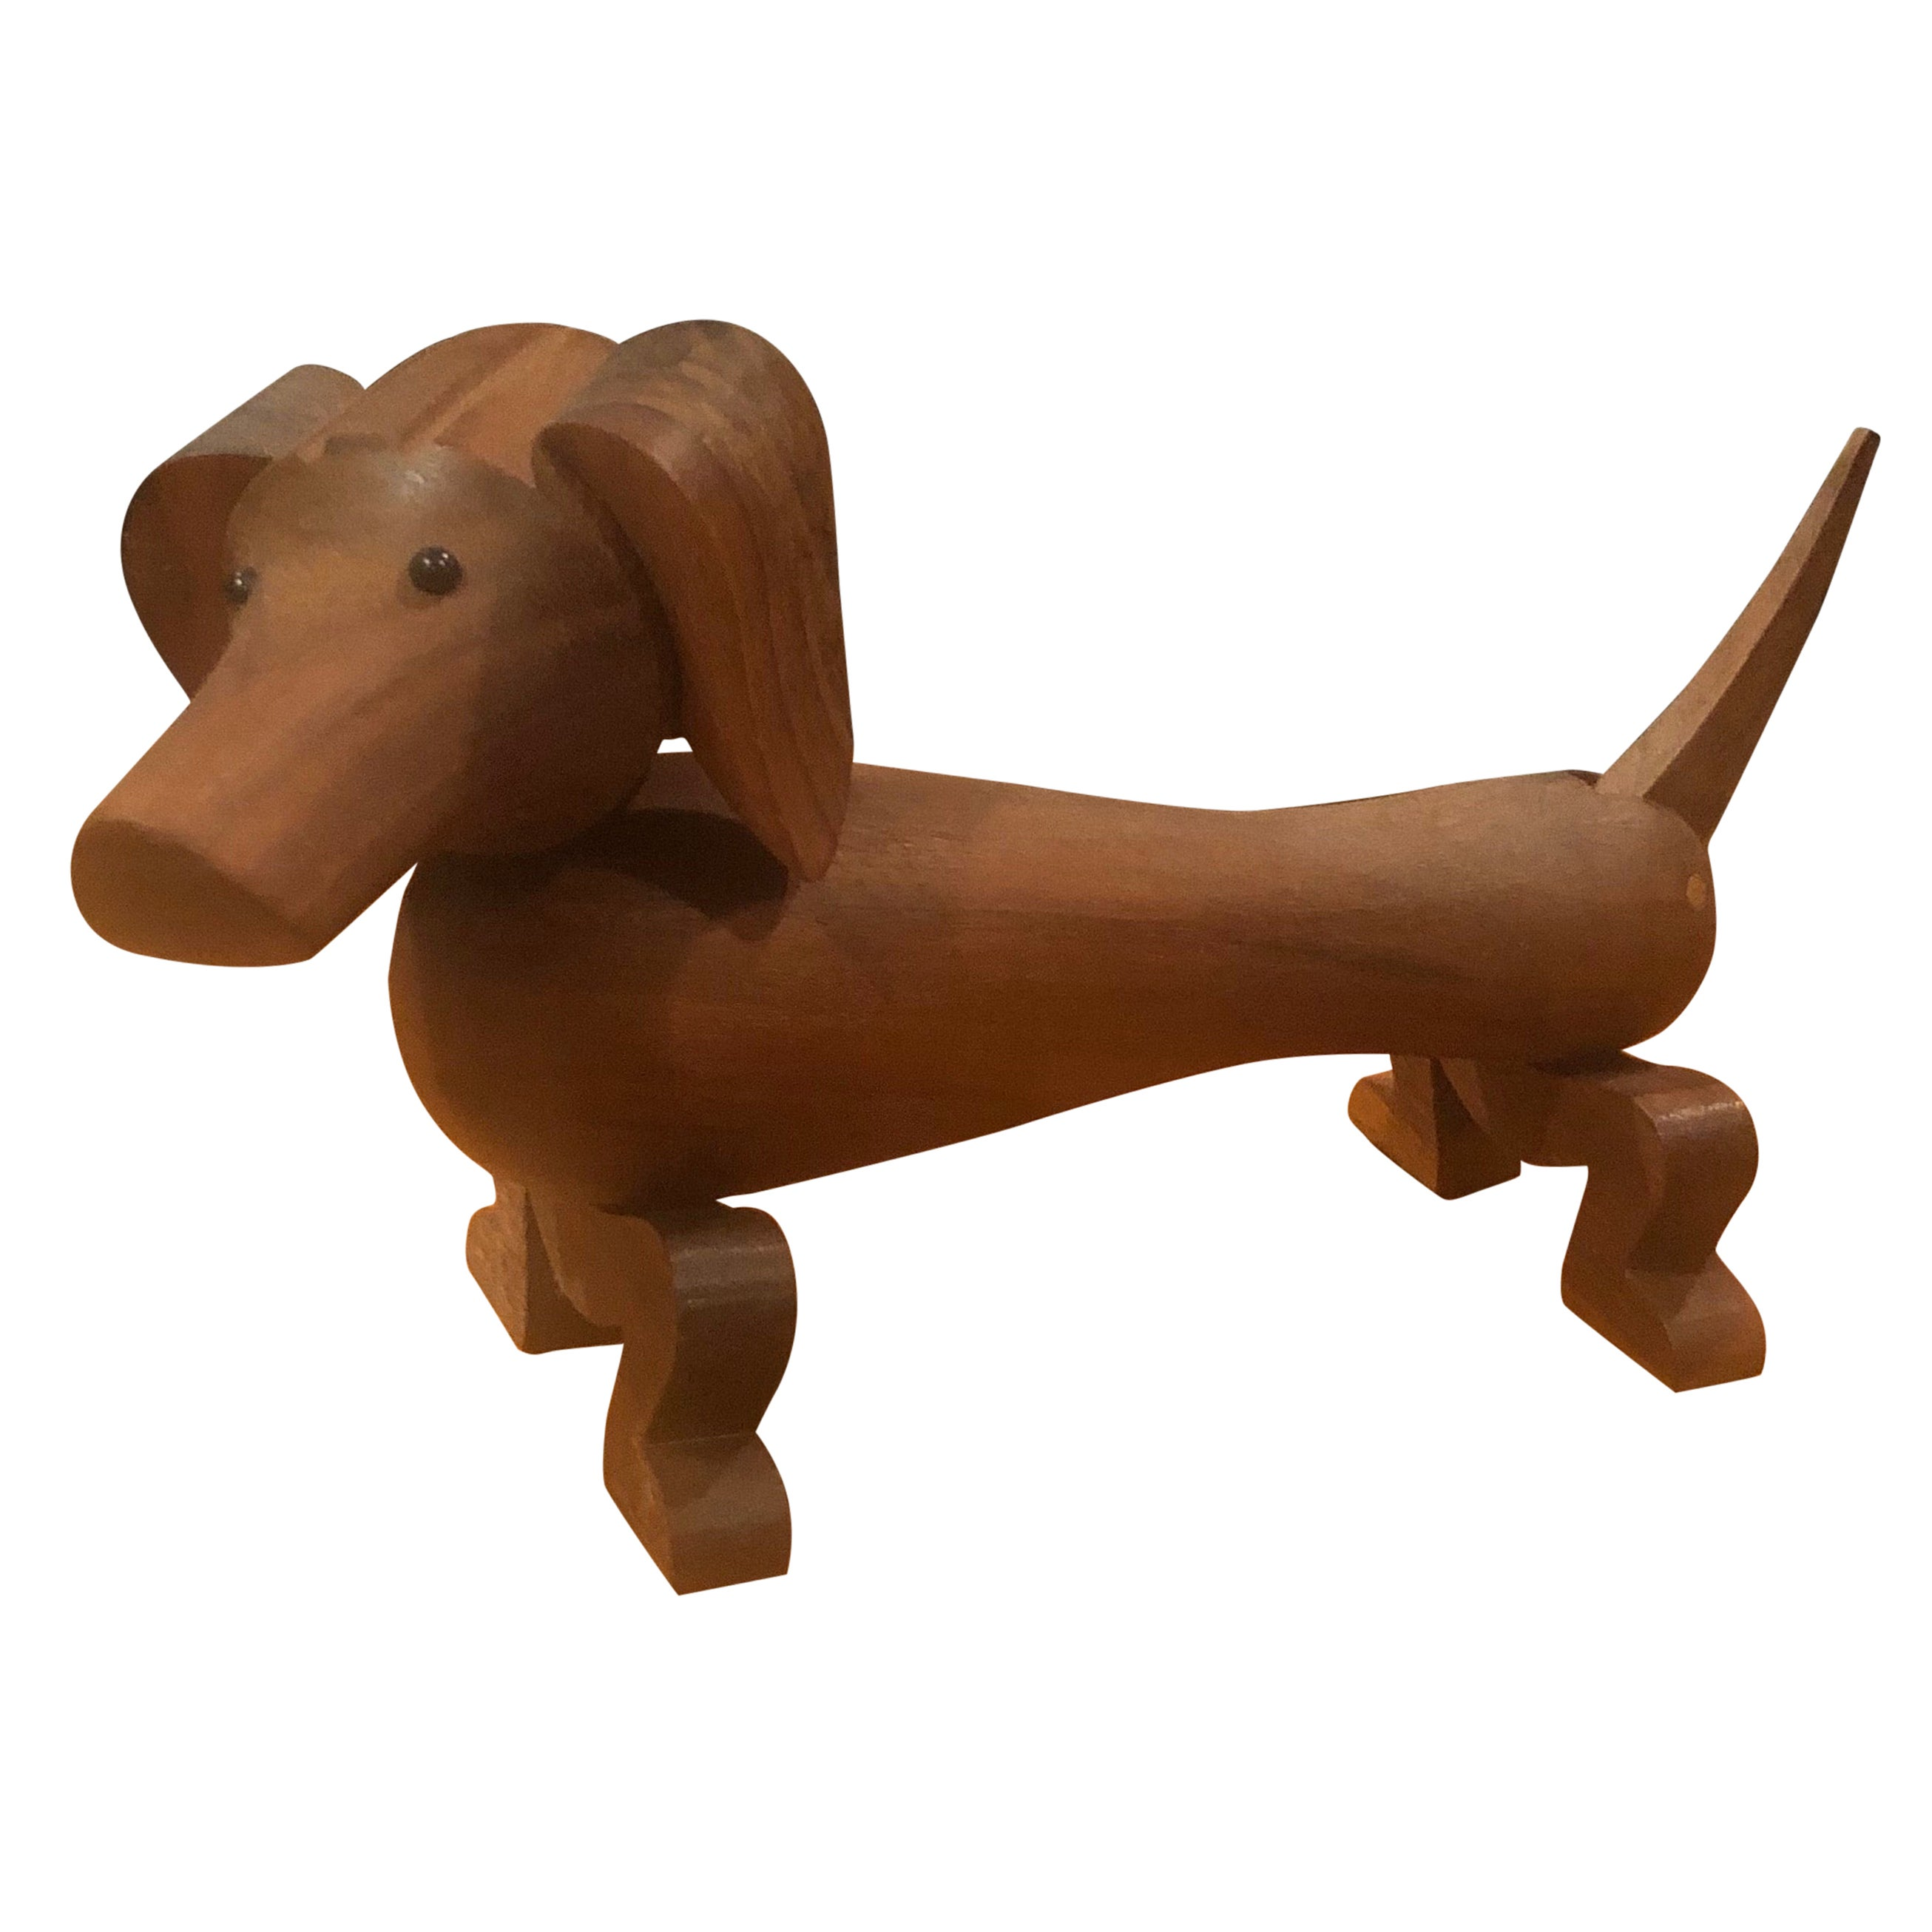 Articulated Toy Dachshund / Dog by Kay Bojesen